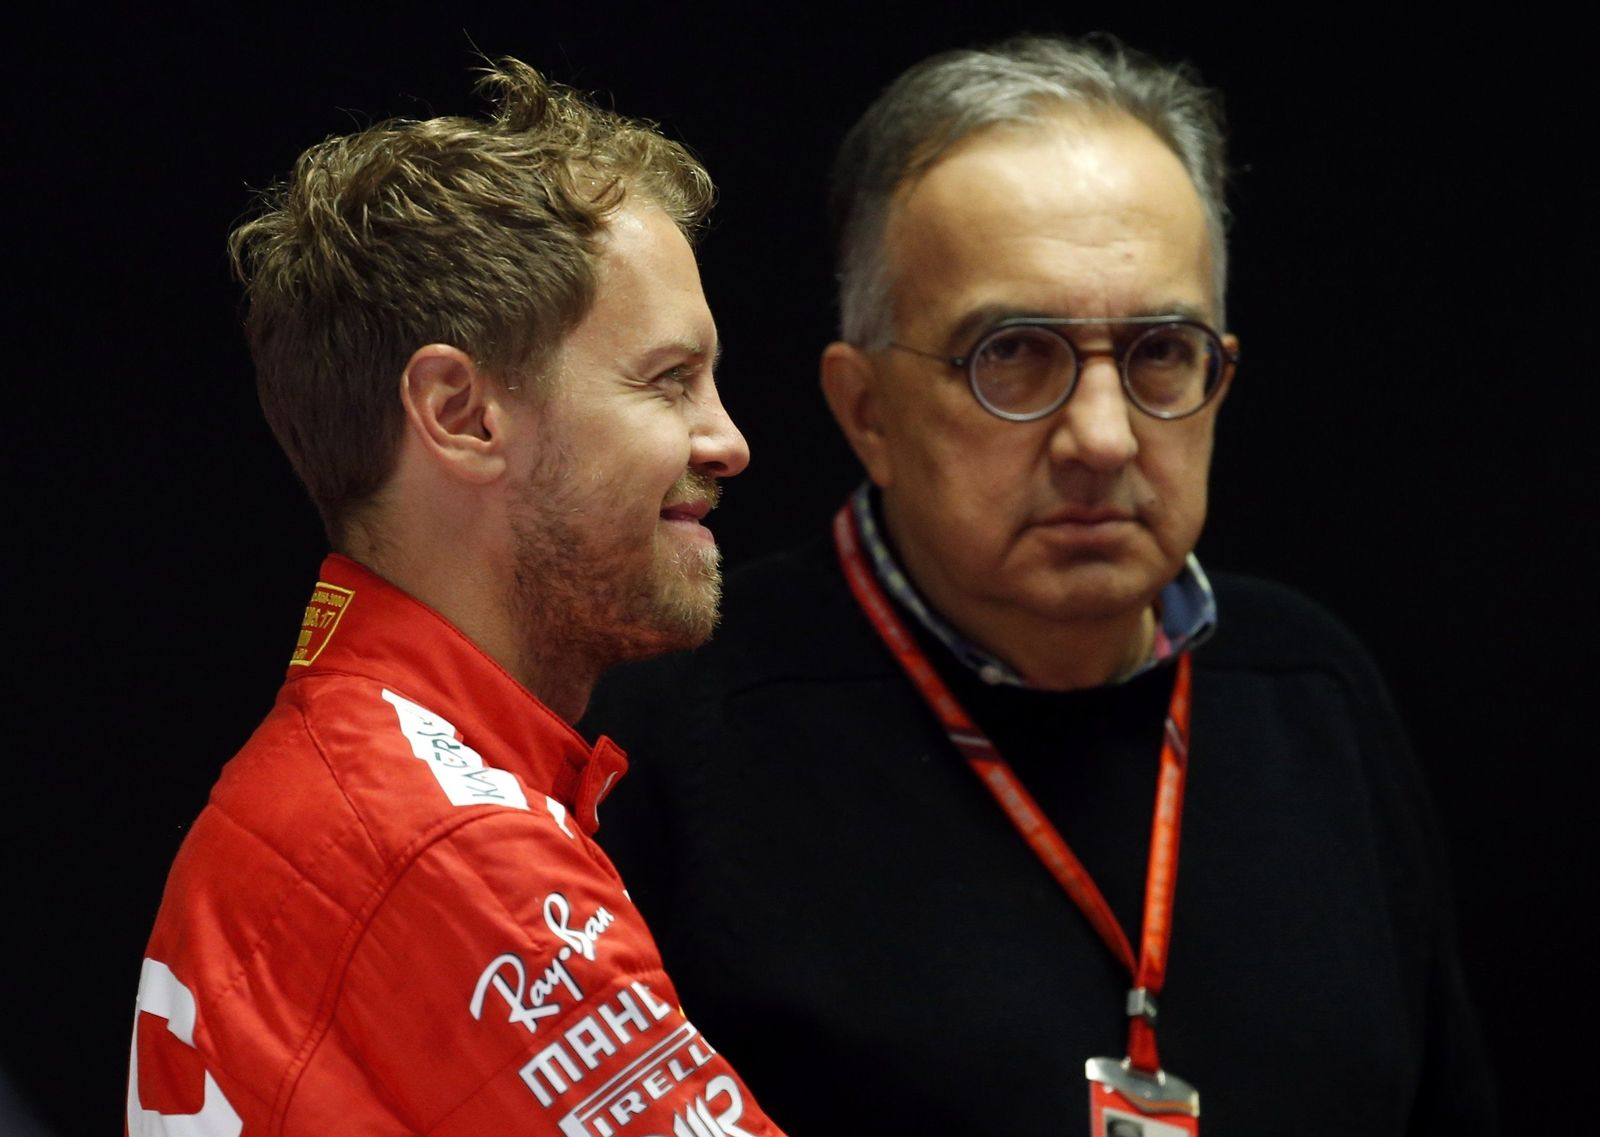 Sebastian Vettel und Sergio Marchionne